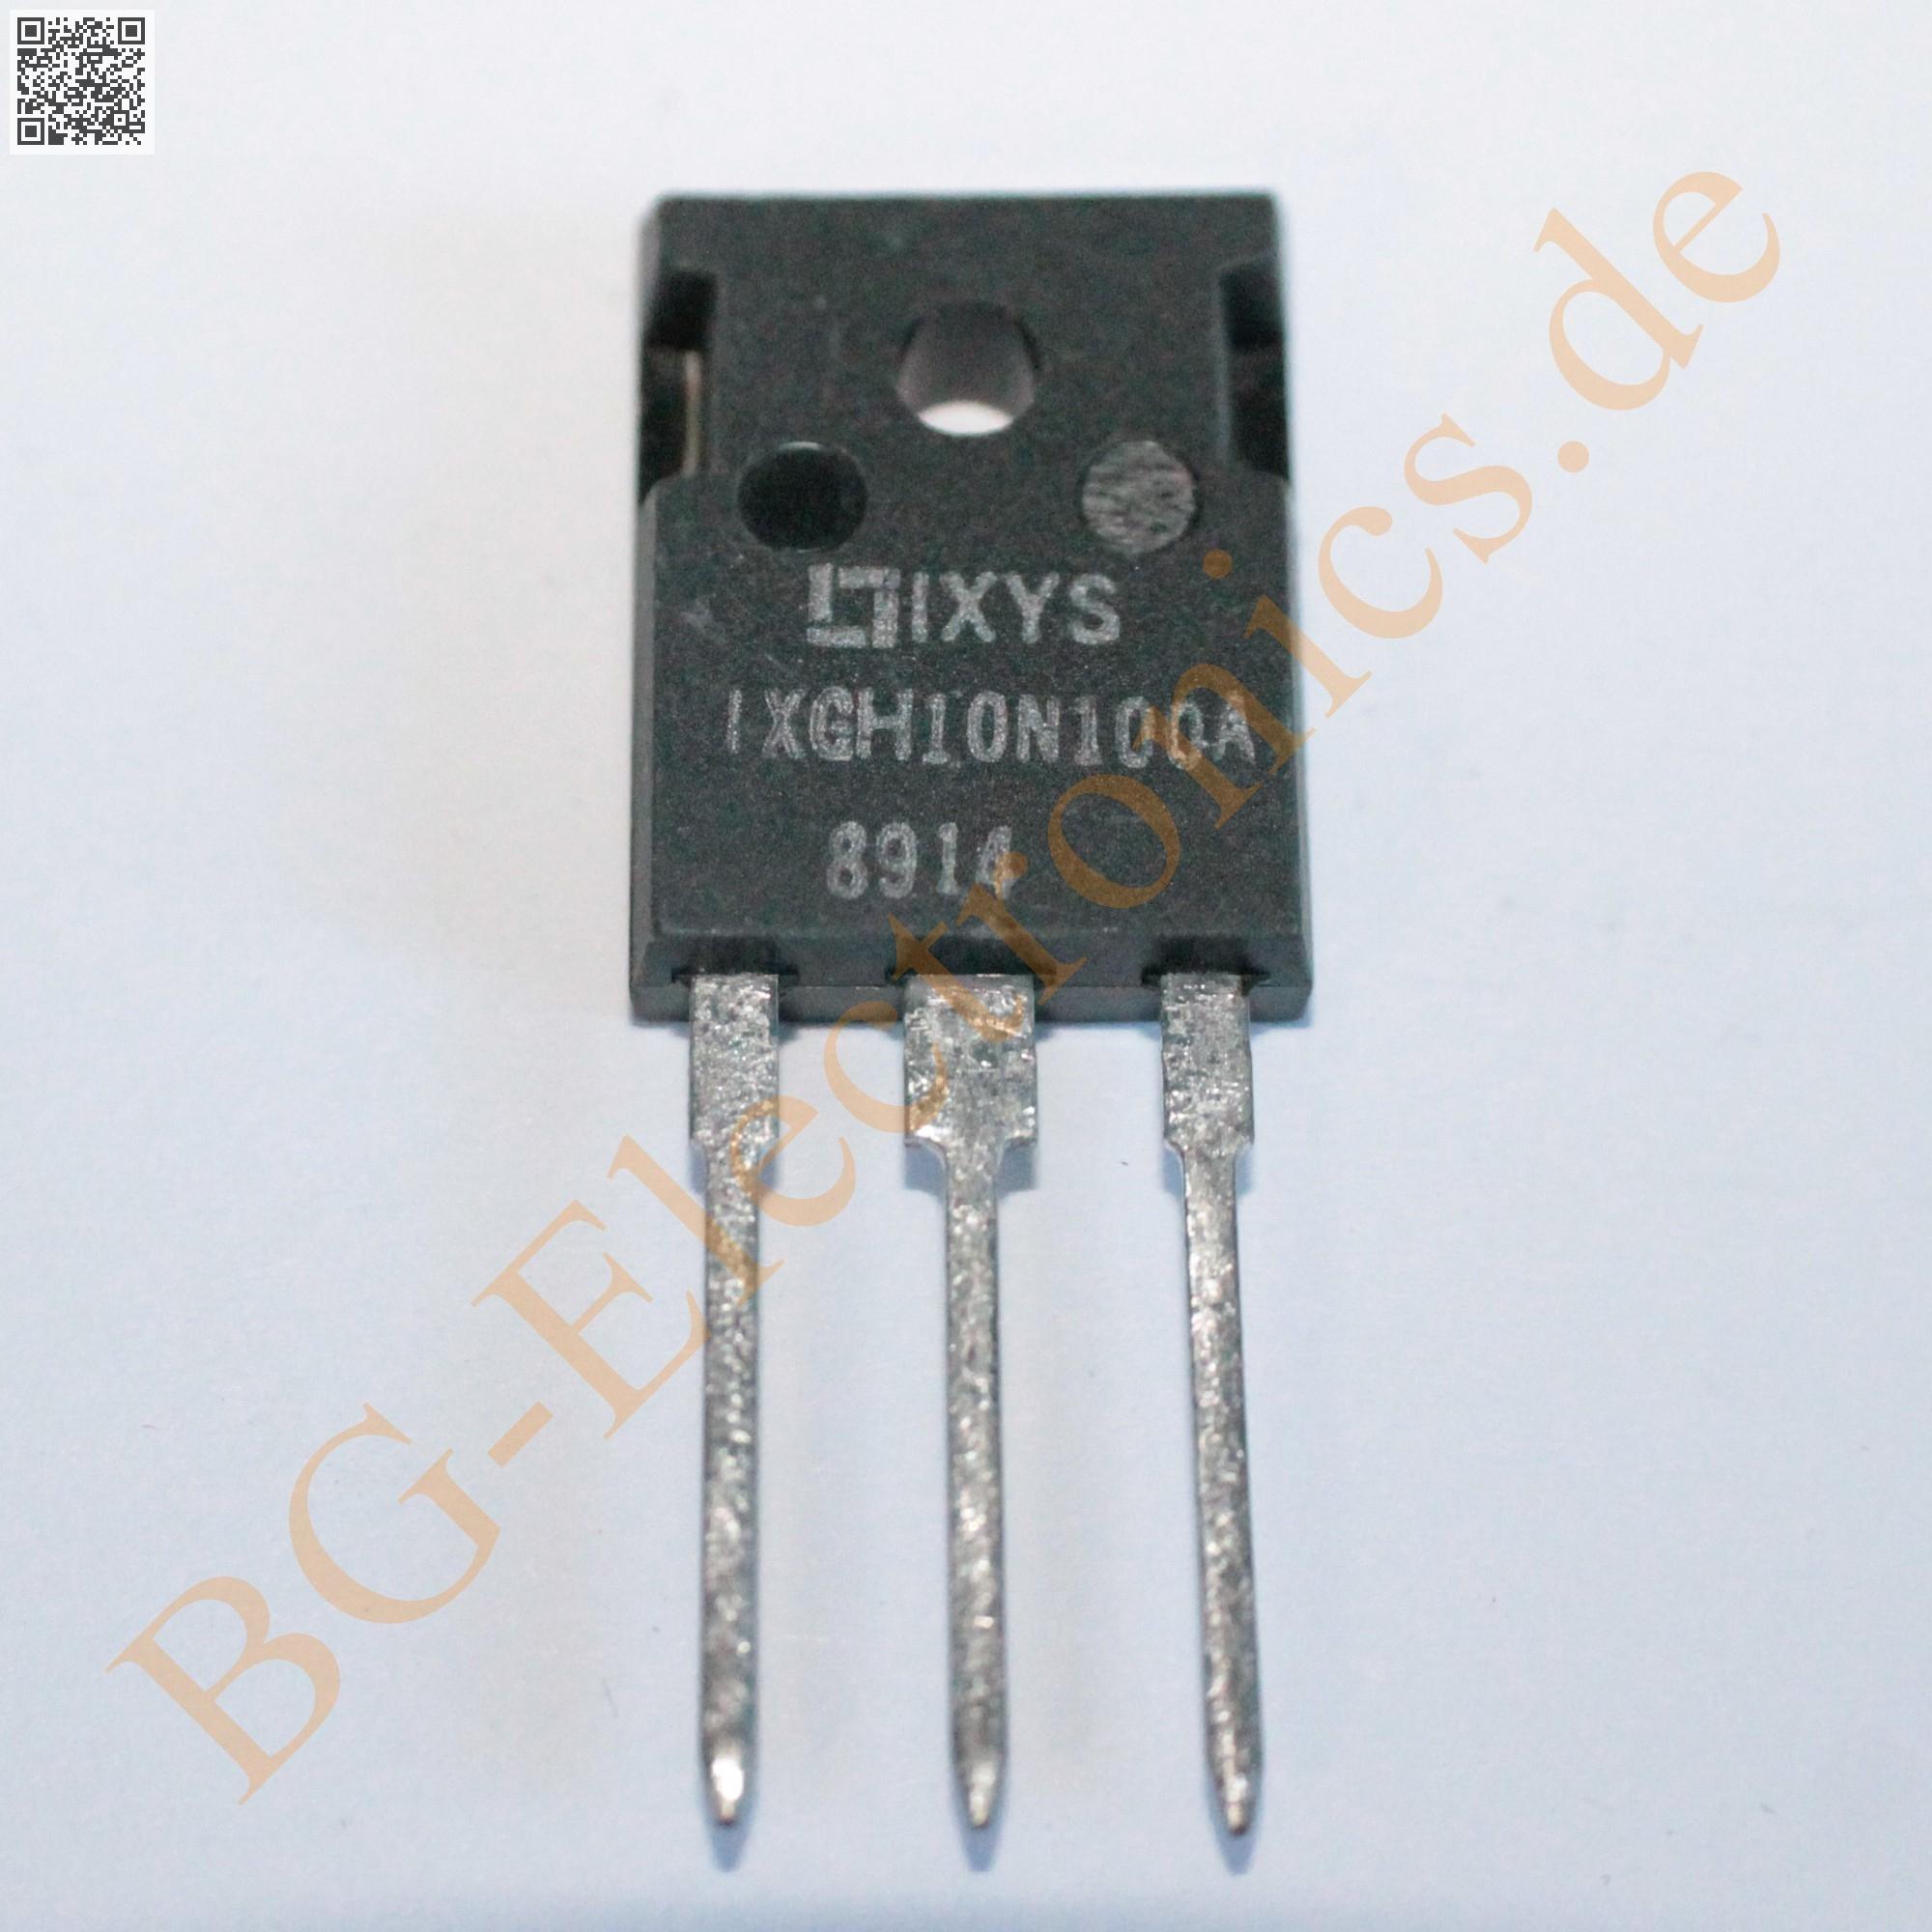 IXYS IXGH40N60B2D1 TO-247 Low VCE IGBT High speed sat